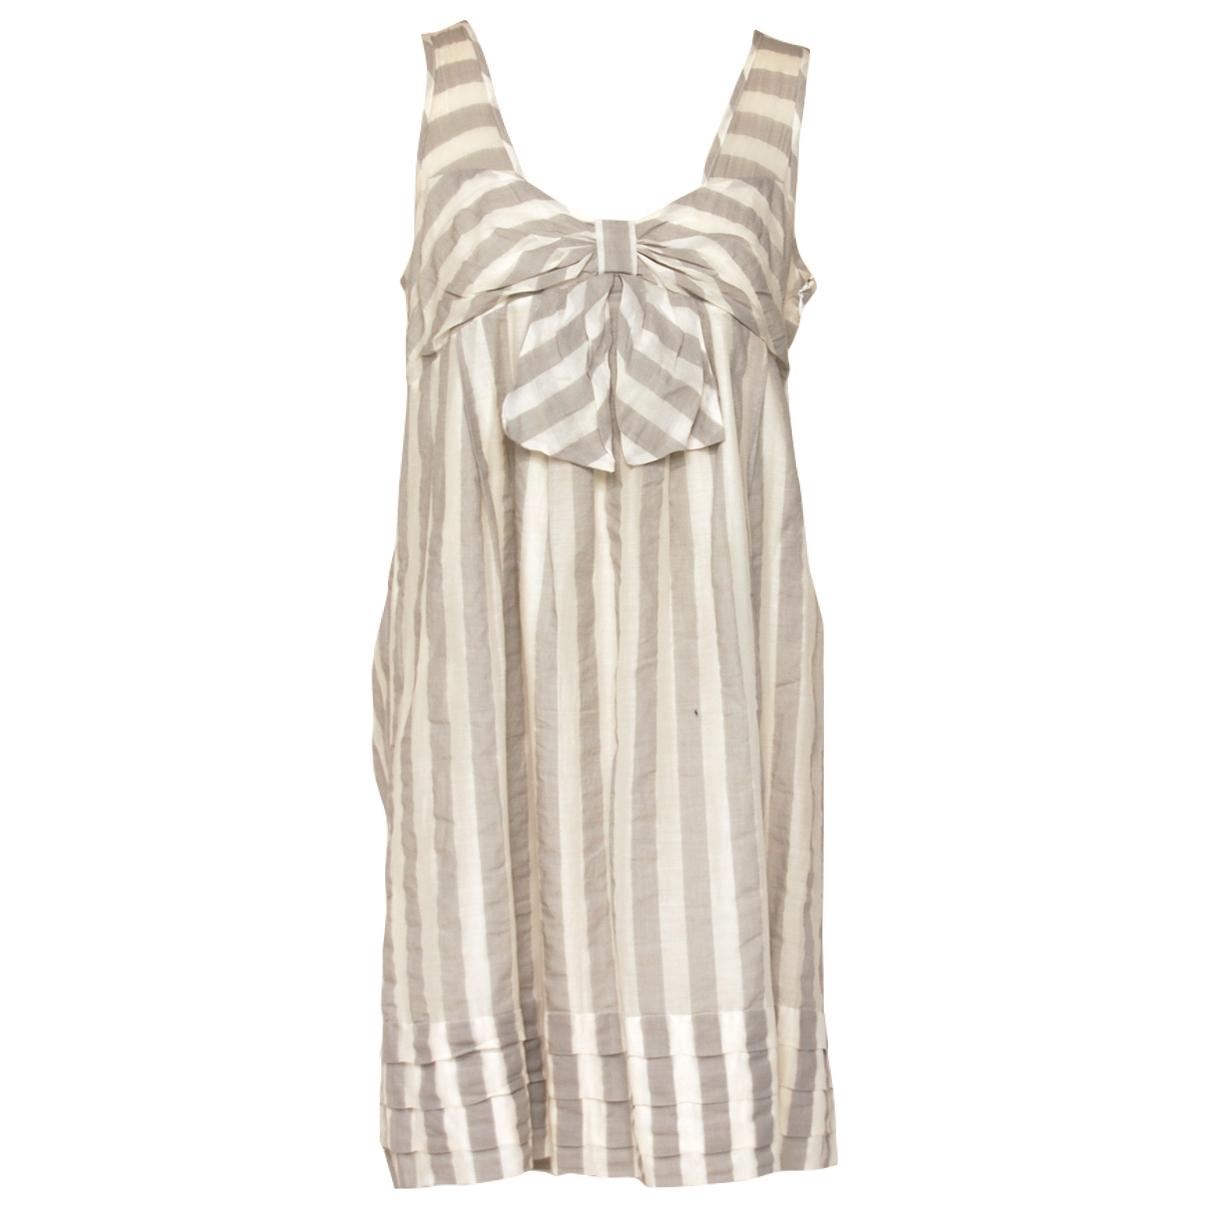 Eley Kishimoto \N Multicolour Cotton dress for Women M International